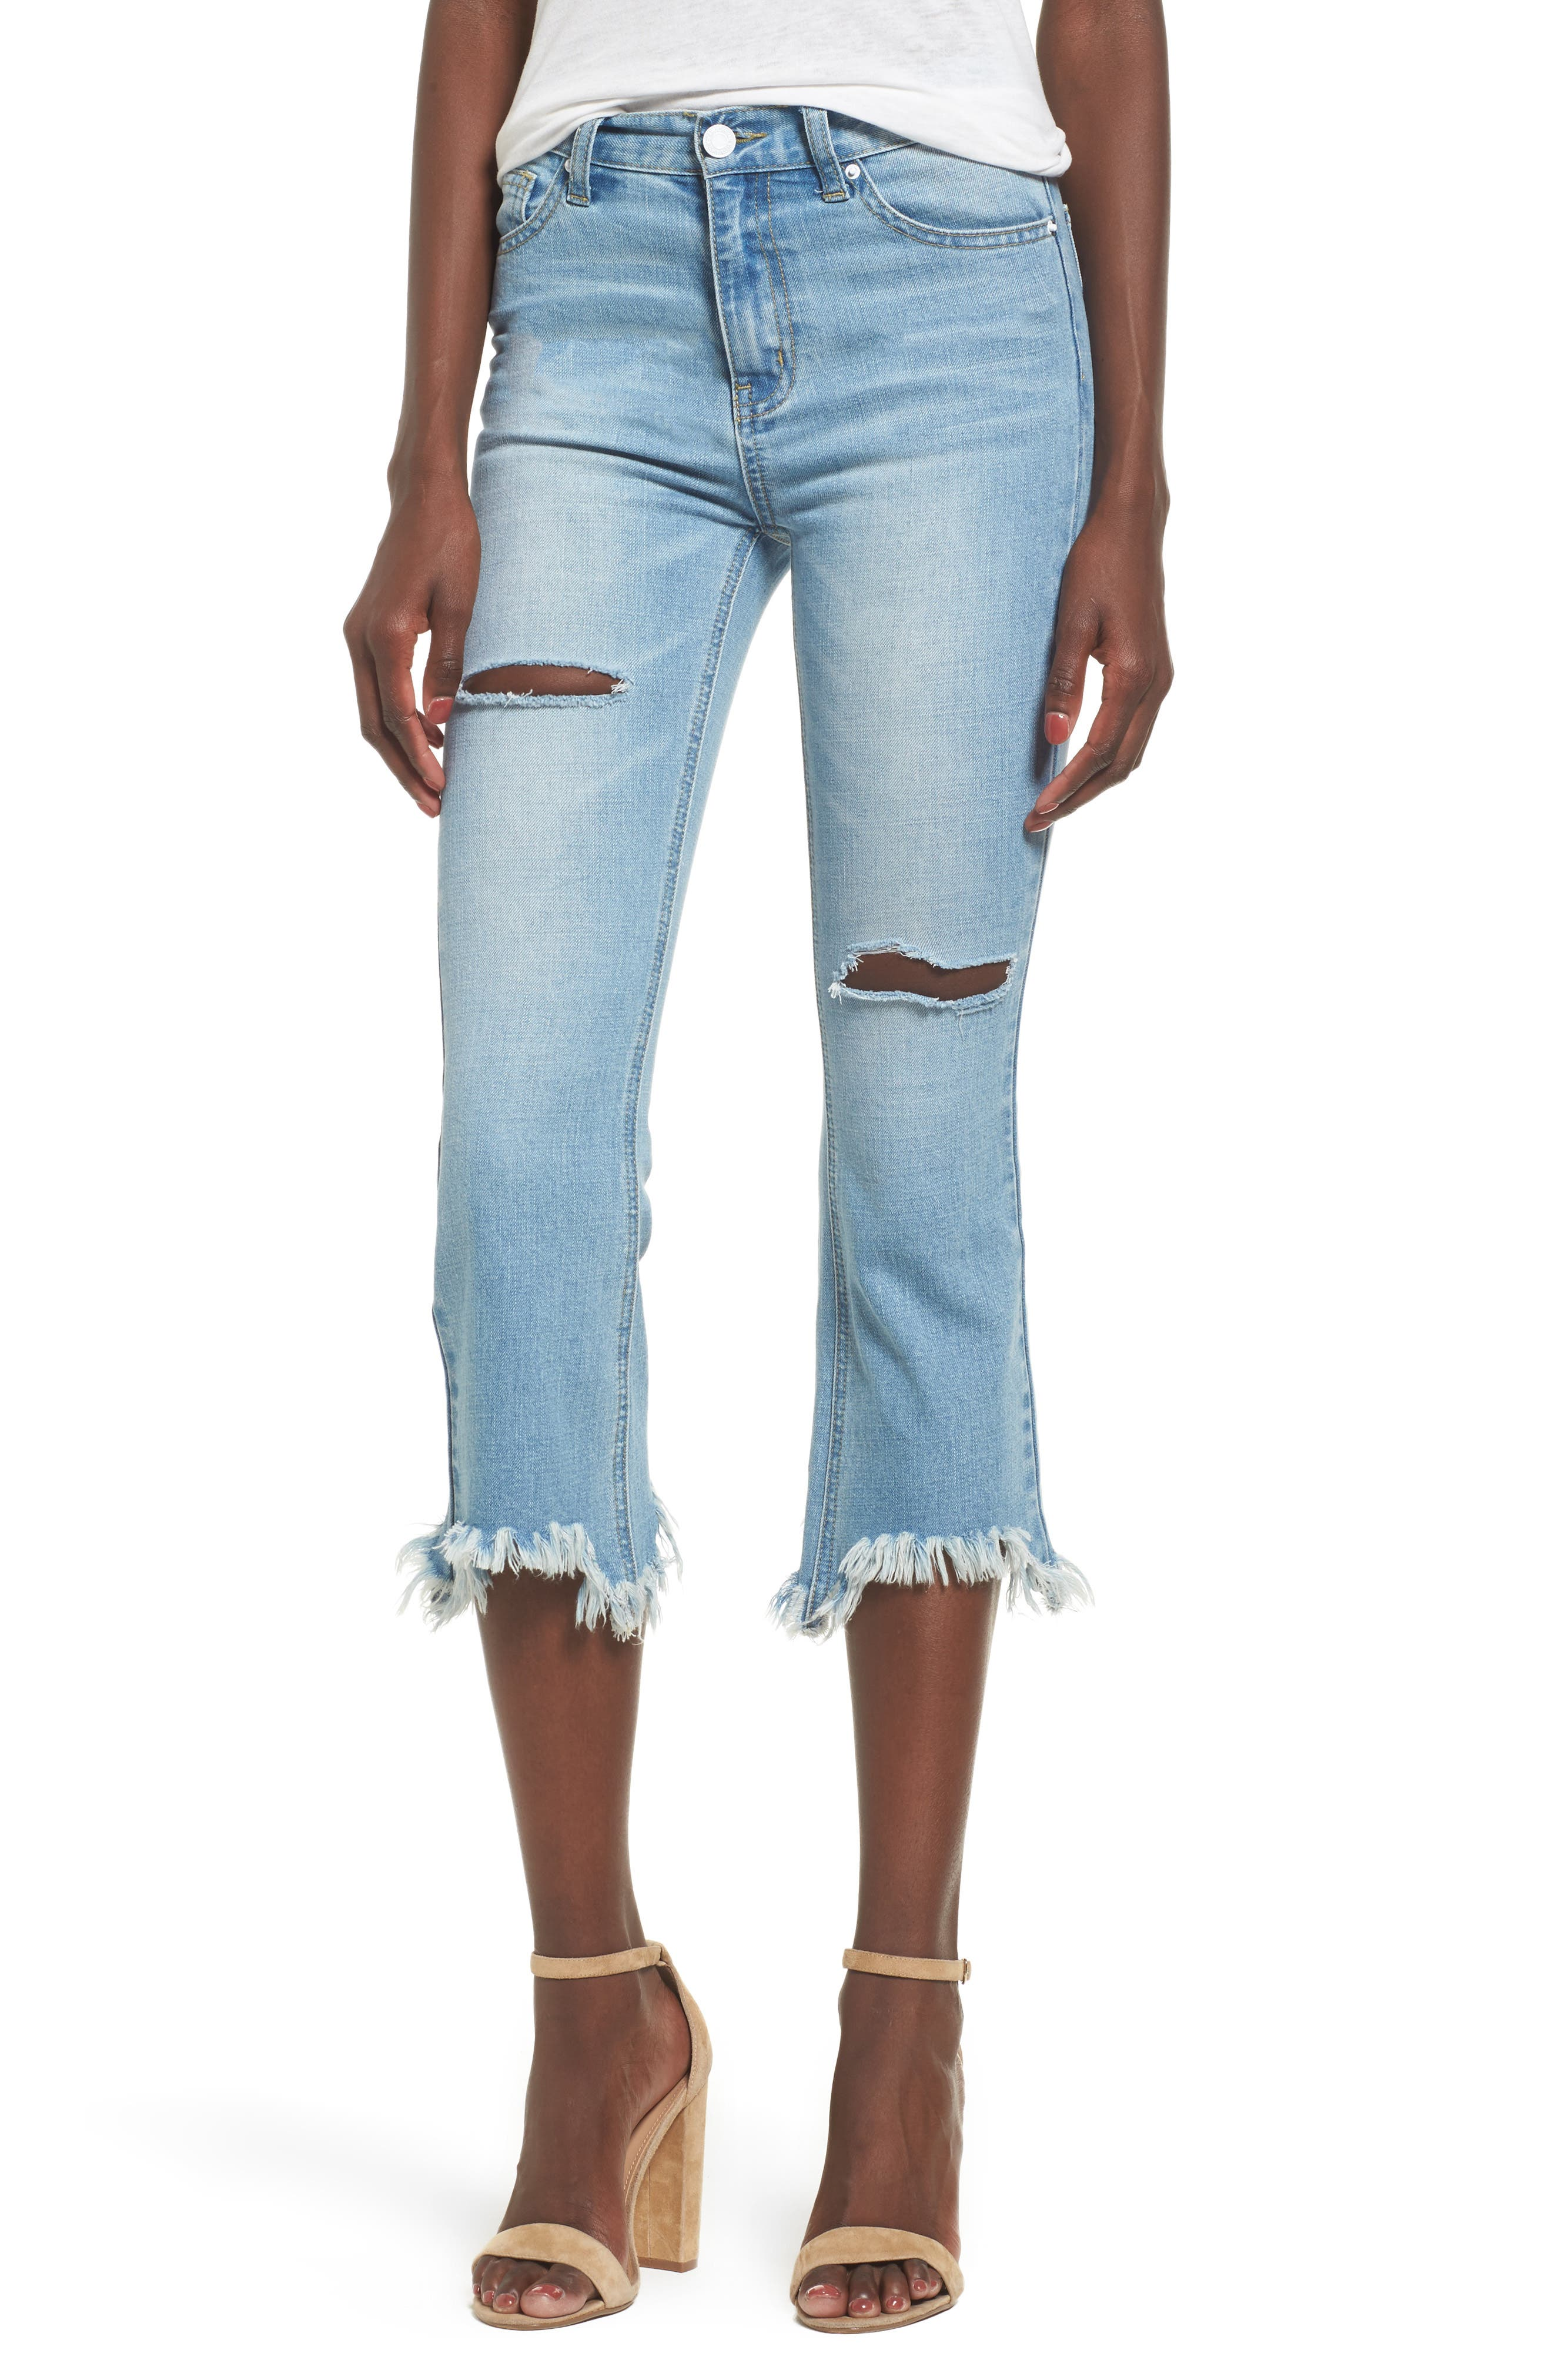 EVIDNT Ripped Fray Hem Crop Jeans